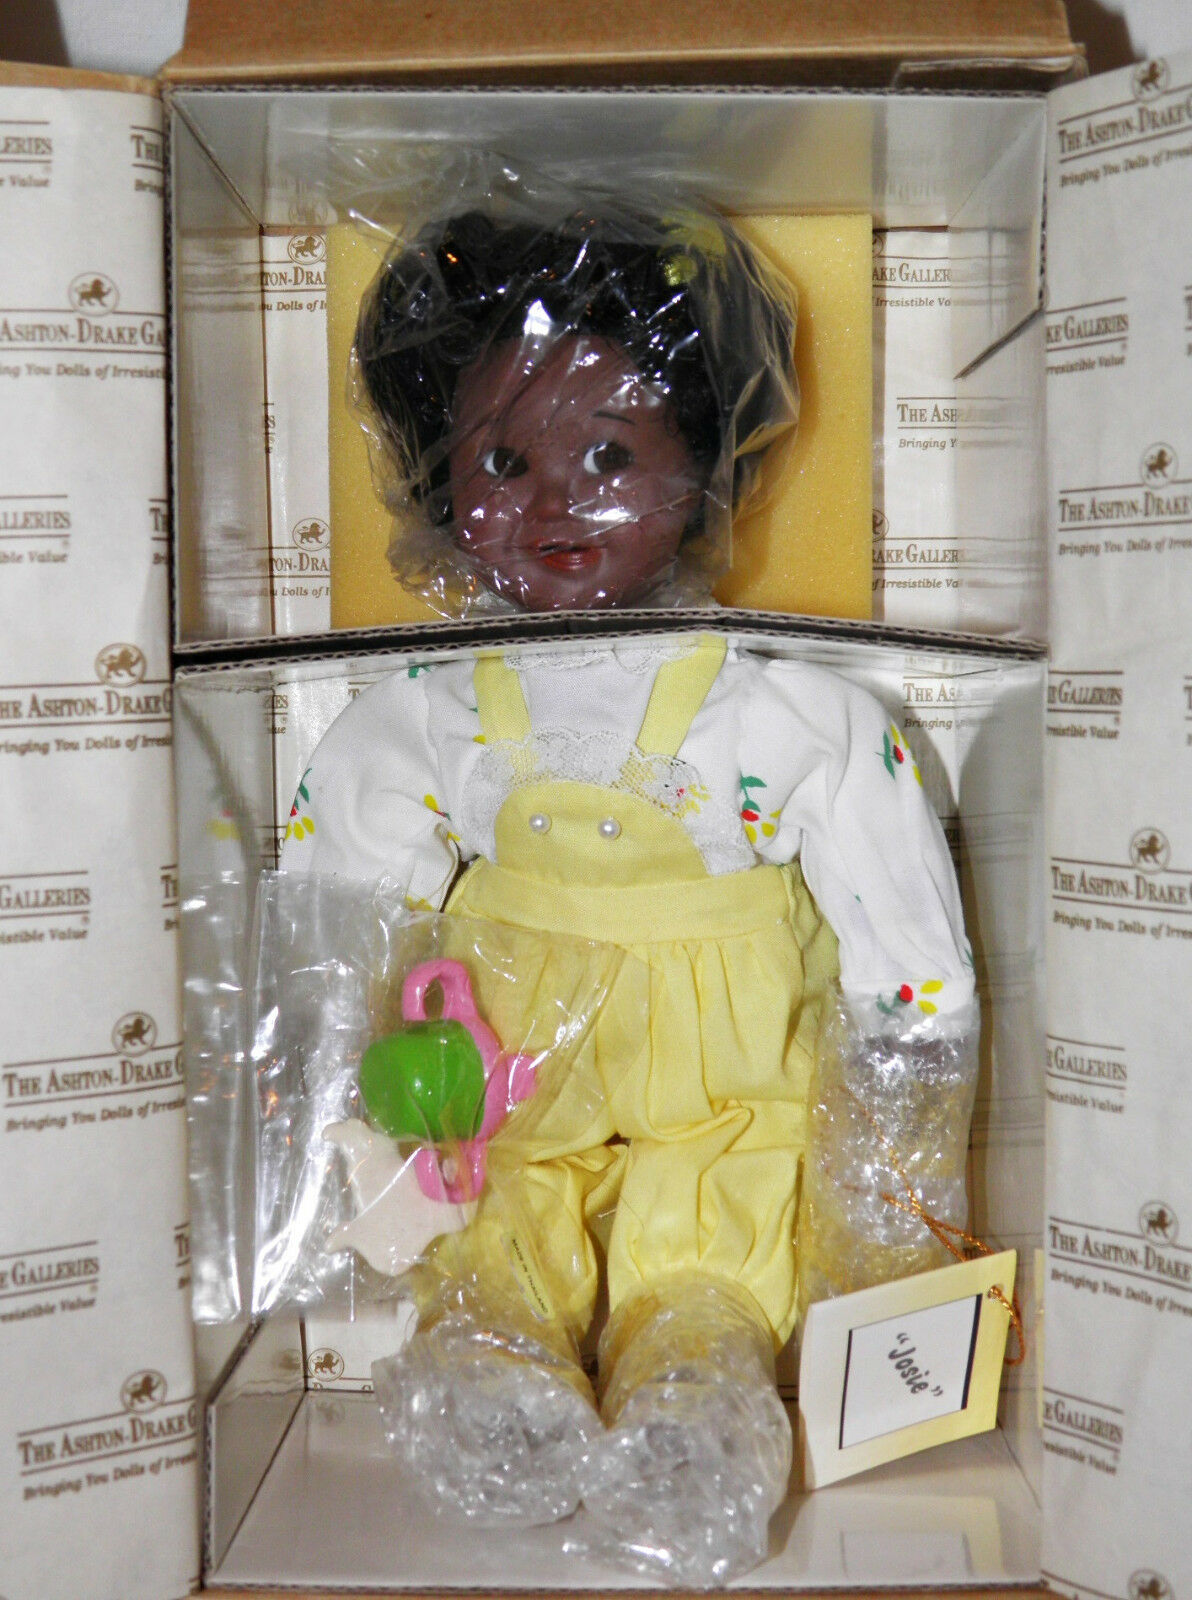 1993 ASHTON DRAKE African American JOSIE Doll BABY GIRL Limited Edition MIB COA